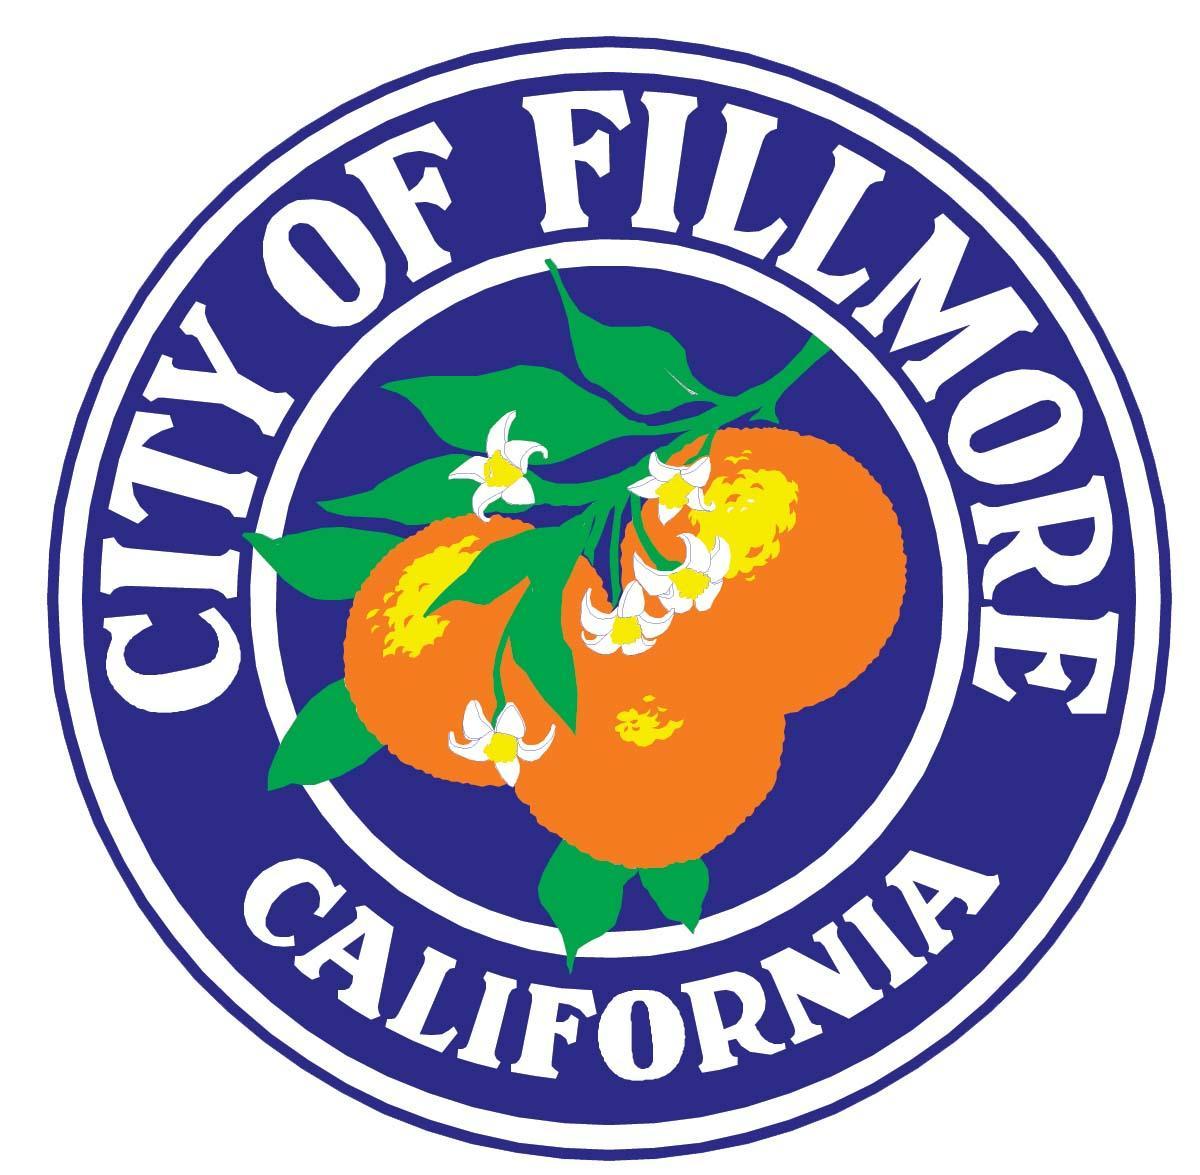 city of fillmore.jpg